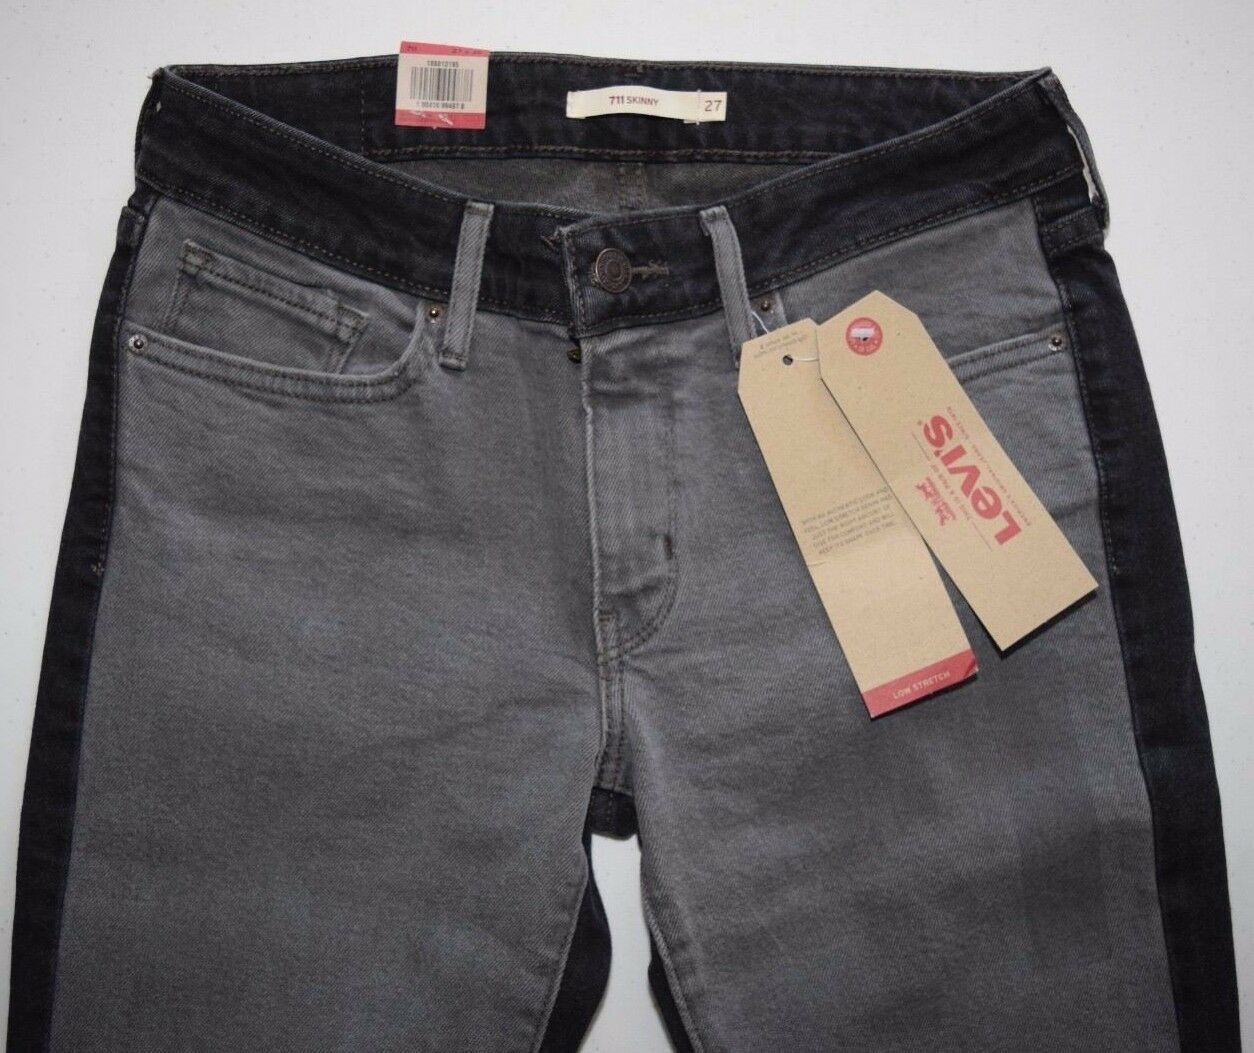 Levi's 711 Women's Skinny BLACK & GREY Jeans 188810195